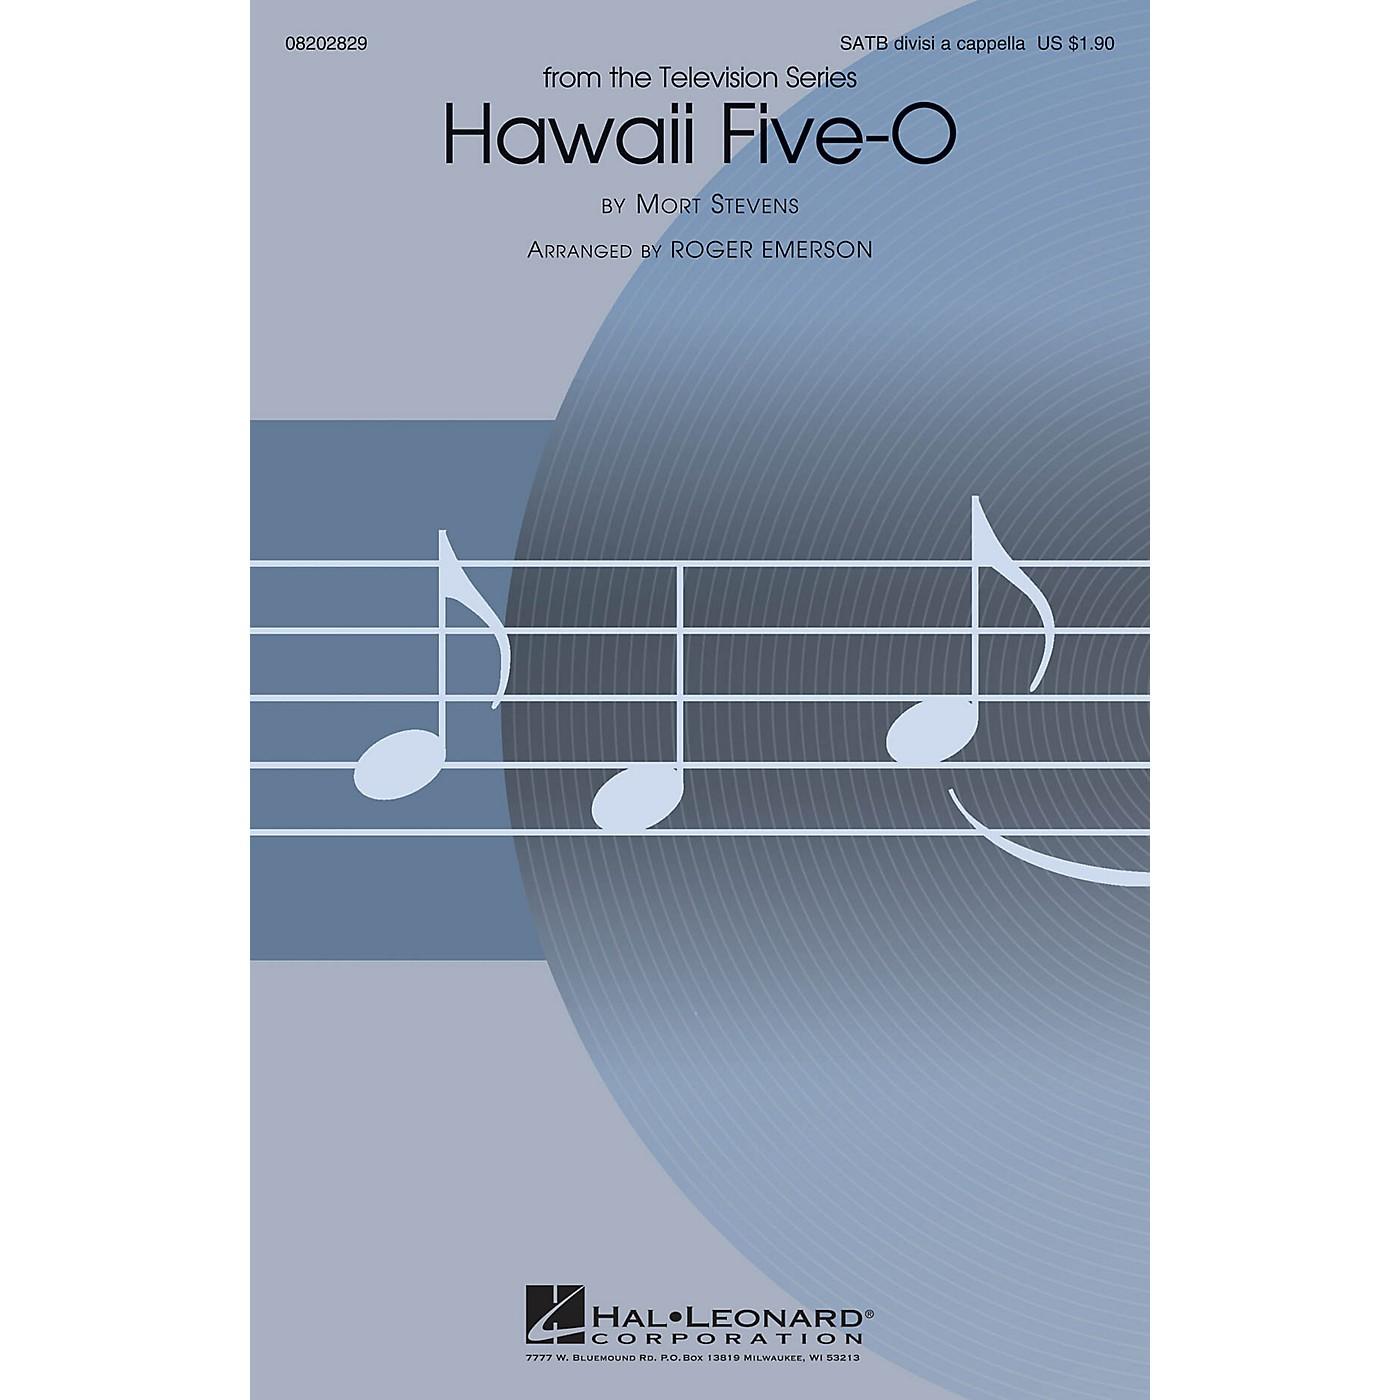 Hal Leonard Hawaii Five-O Theme SATB DV A Cappella arranged by Roger Emerson thumbnail